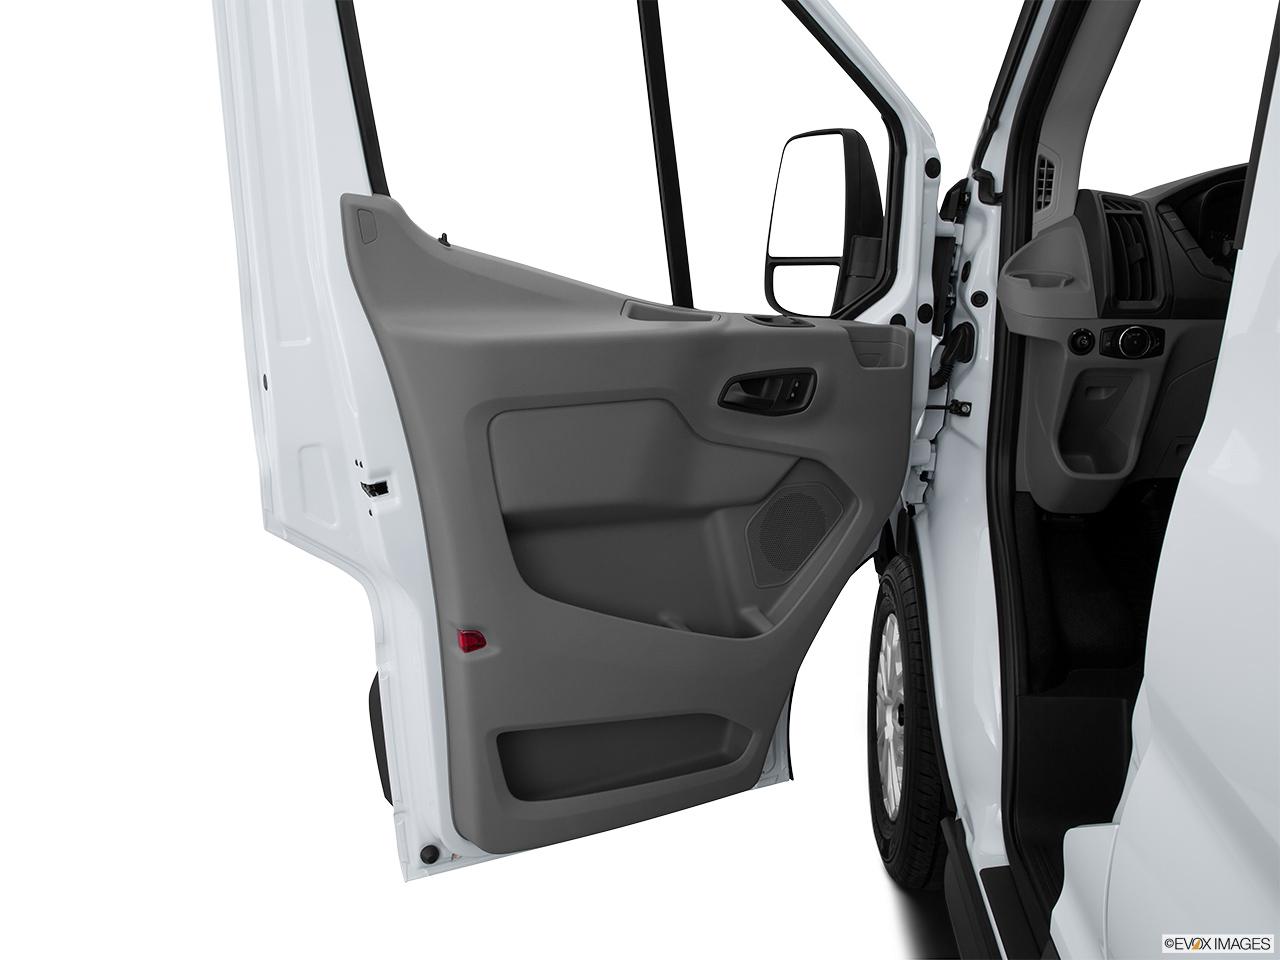 Ford Transit 350 >> 2016 Ford Transit Cutaway T-350 156 9500 GVWR SRW - Inside of driver's side open door, window open